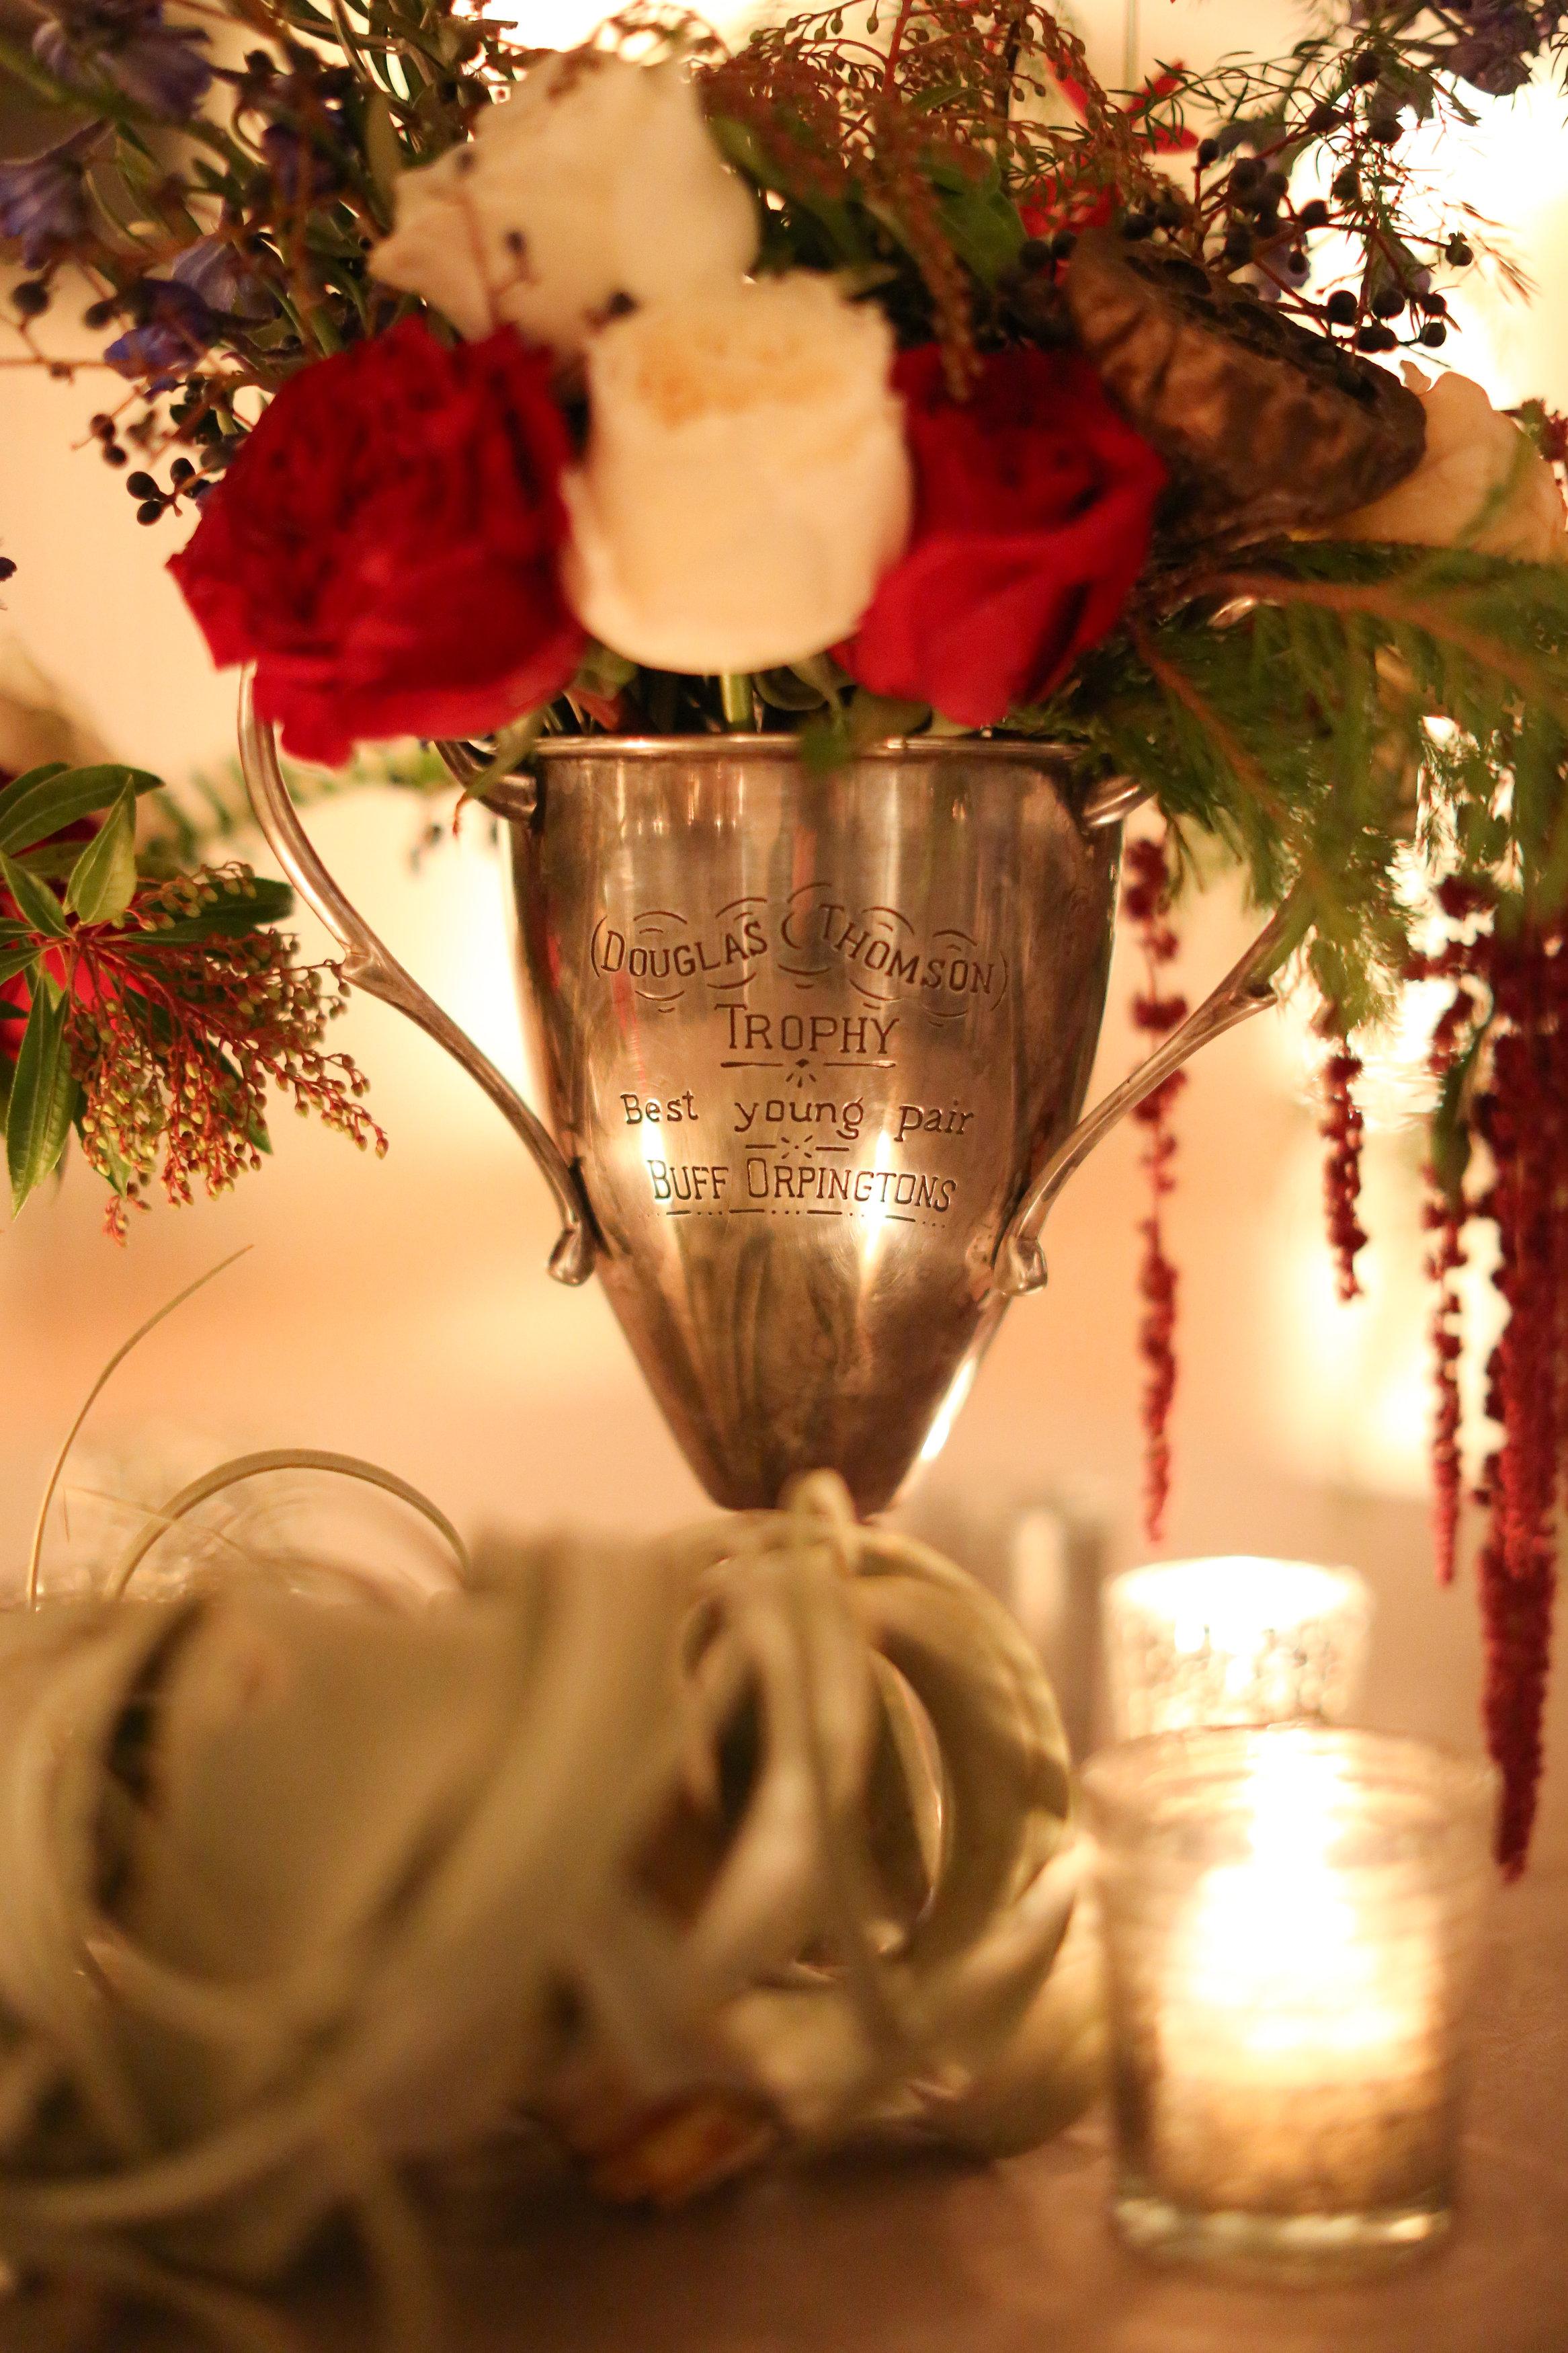 Aaron_Snow_Photography_Dick-Jordan_Wedding_ReceptionDetails.093.jpg